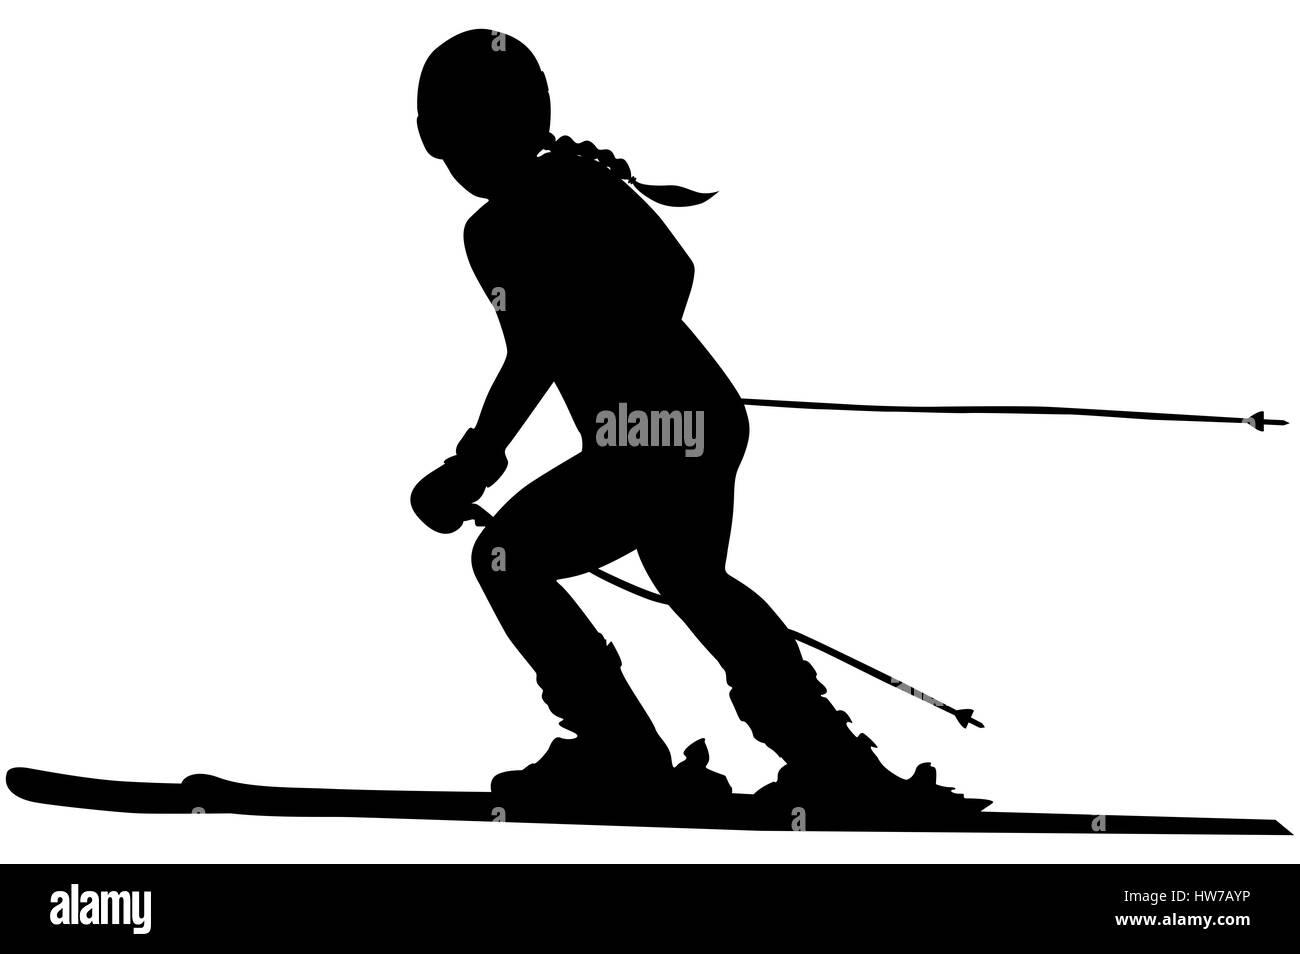 alpine skiing female athlete downhill black silhouette - Stock Image